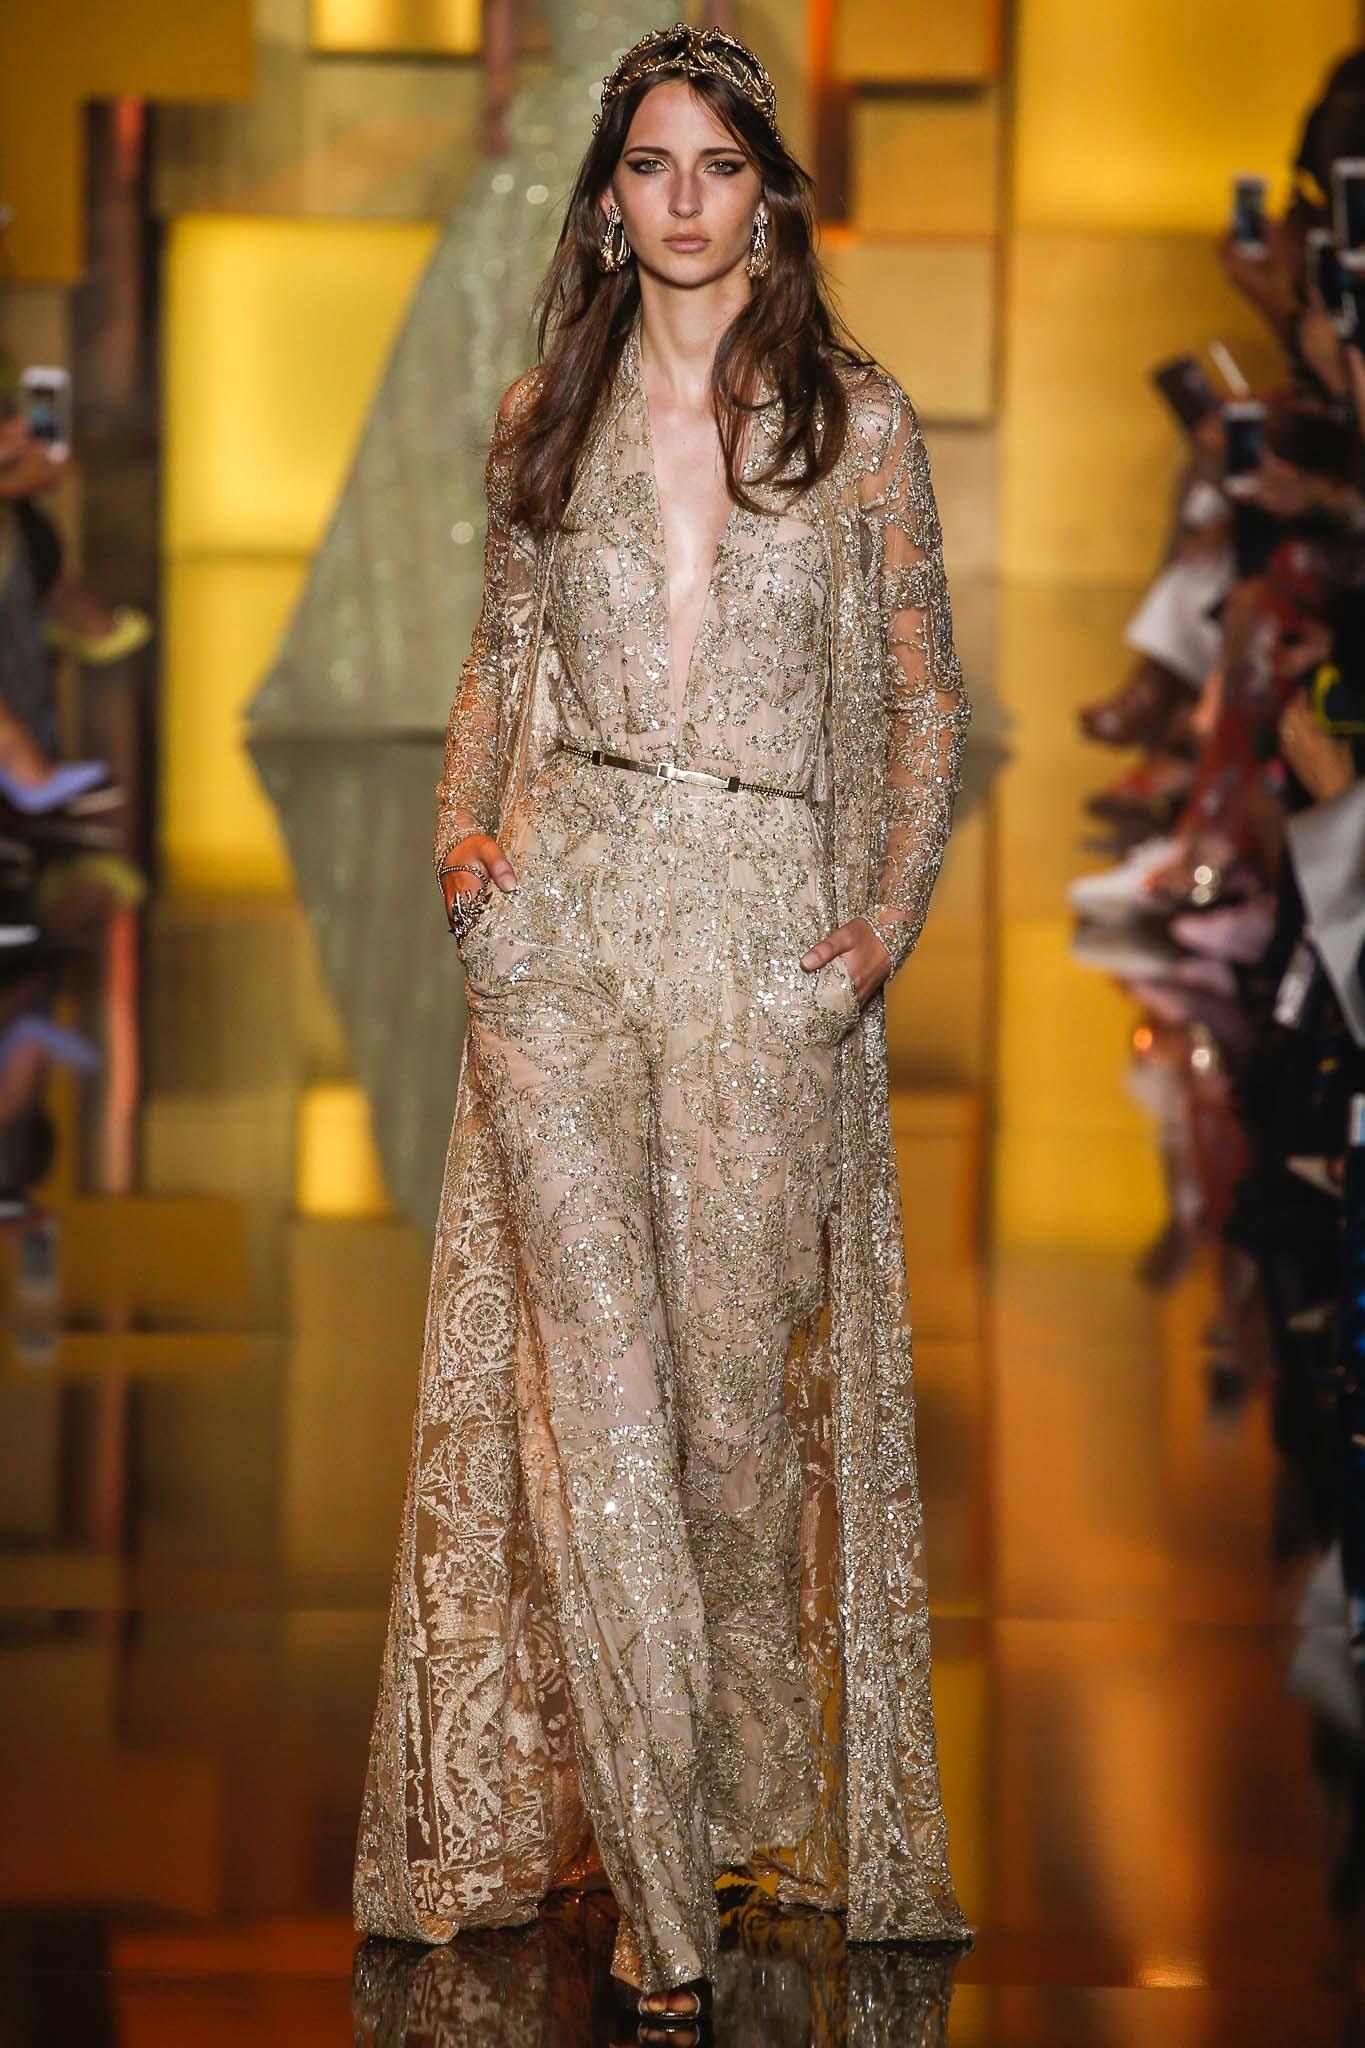 bestie-elie saab haute couture